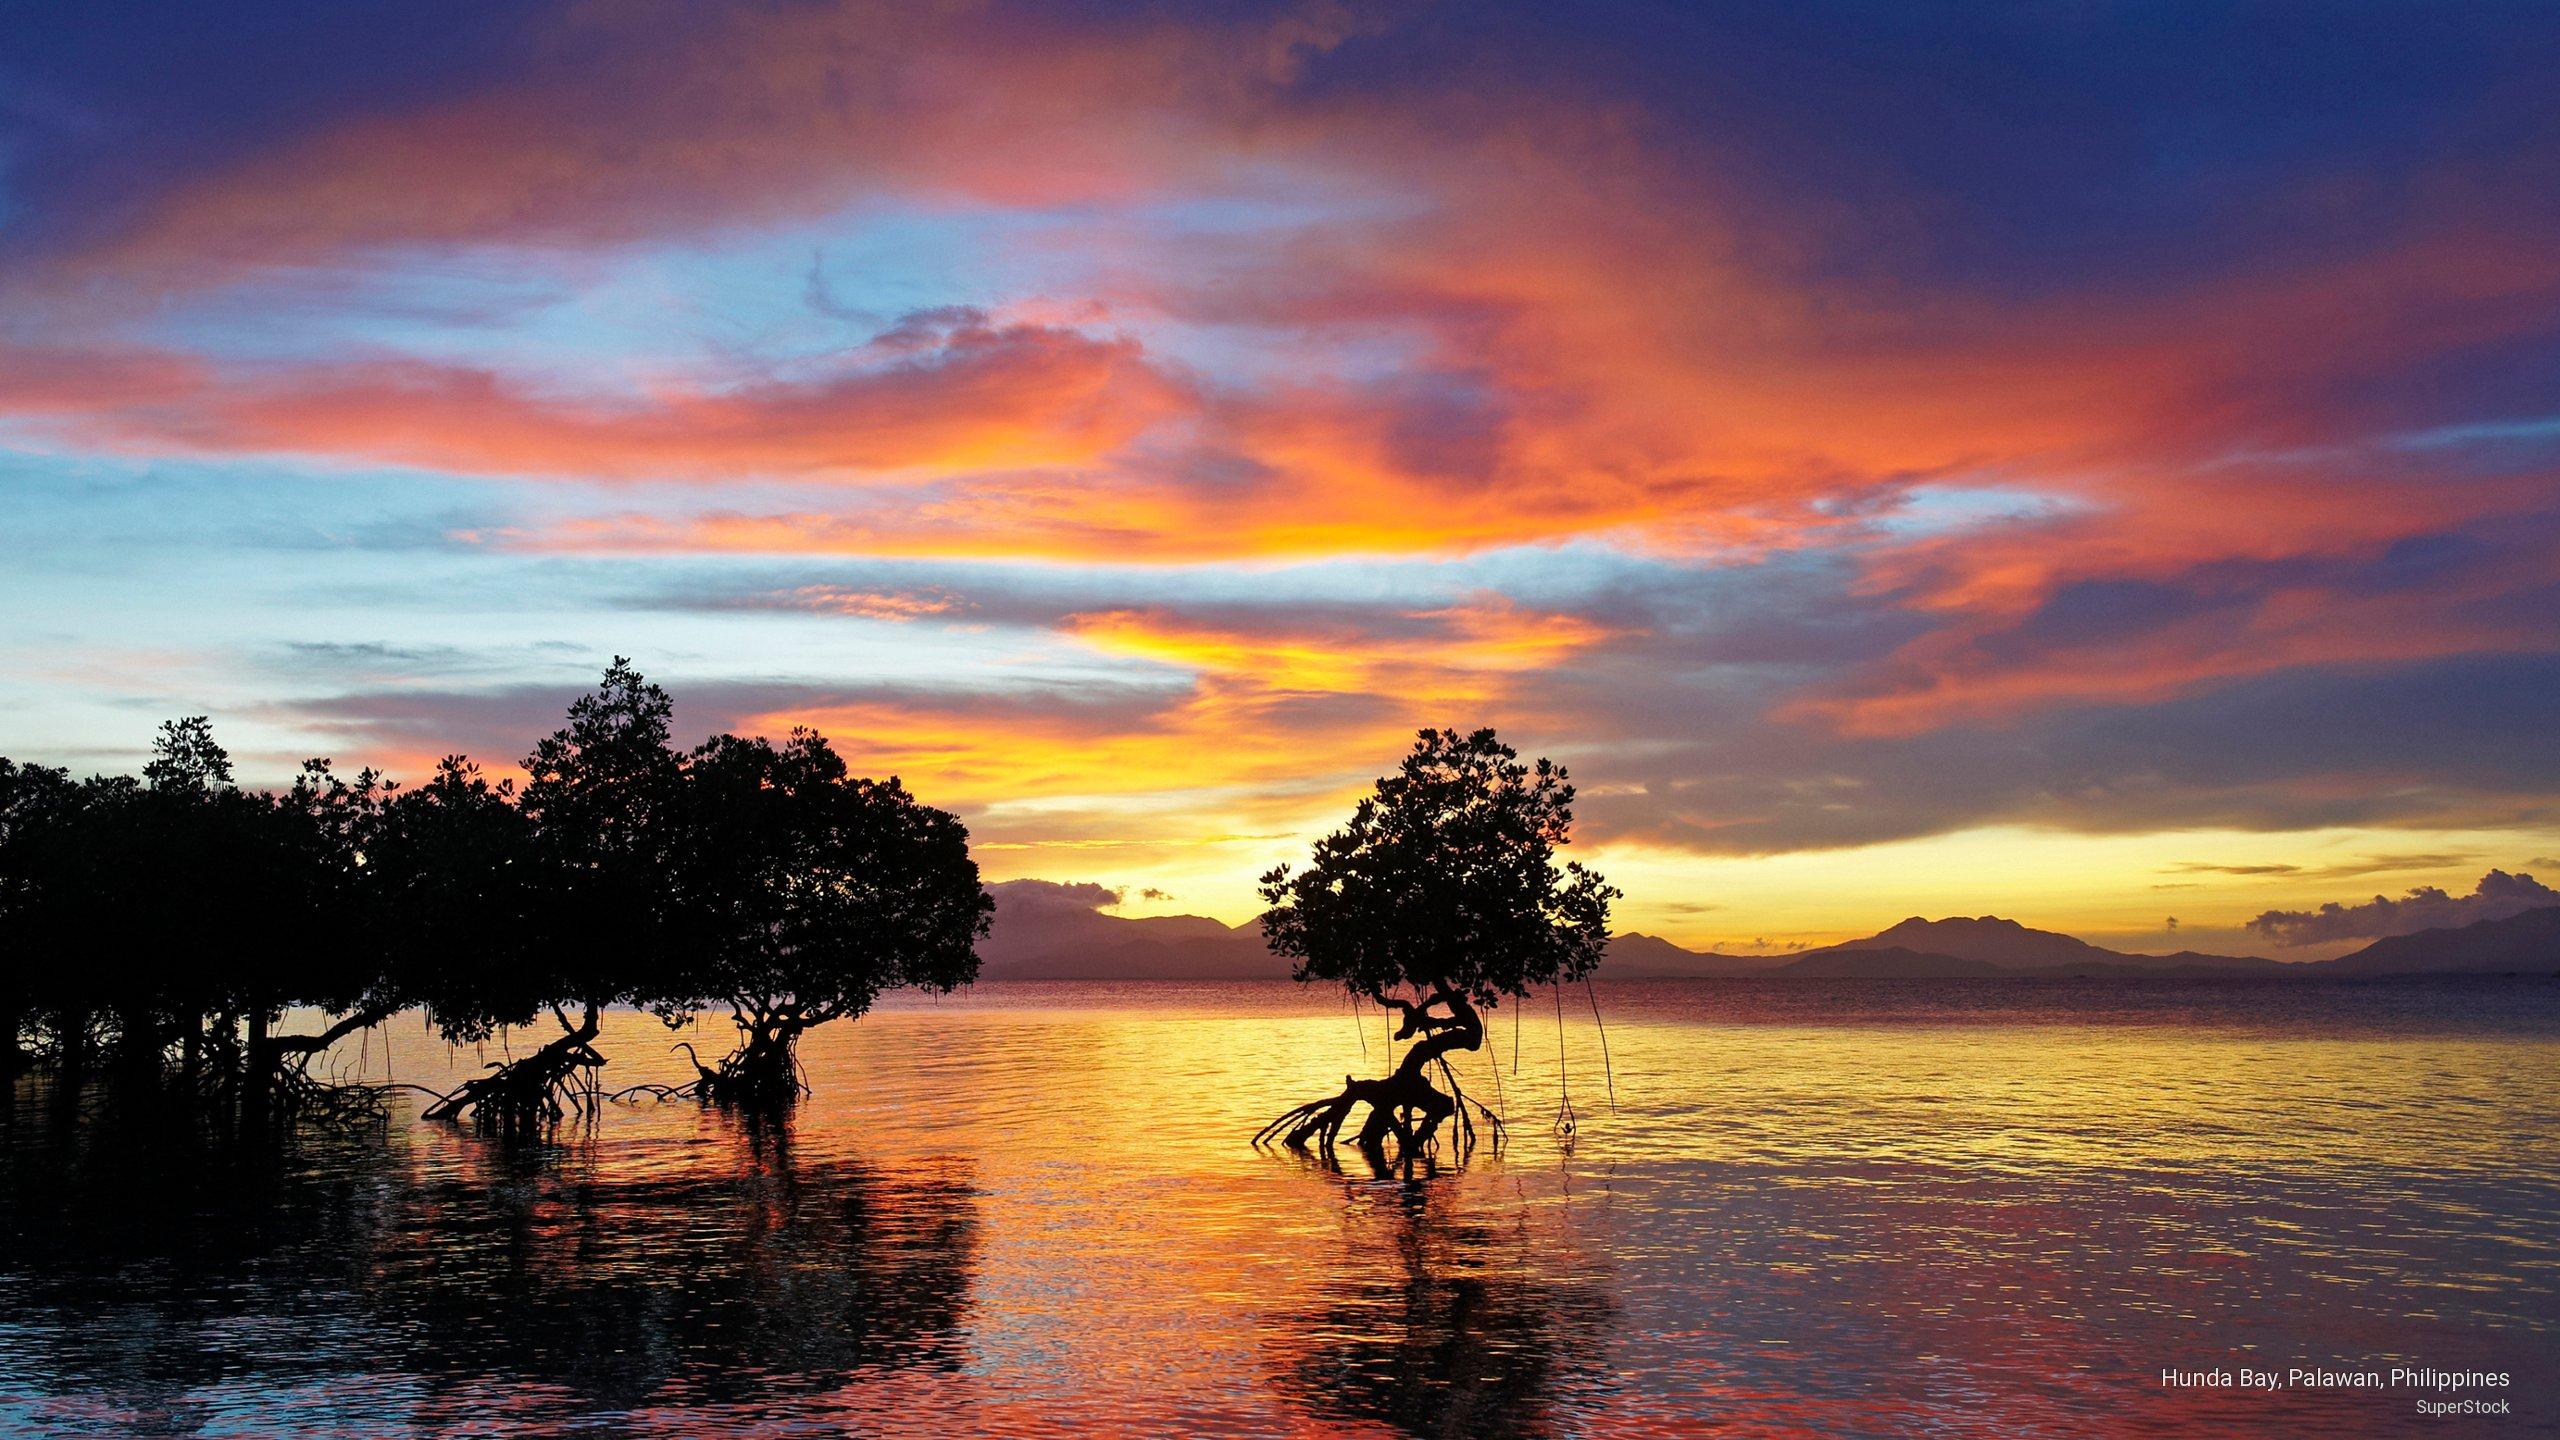 Hunda Bay, Palawan, Philippines